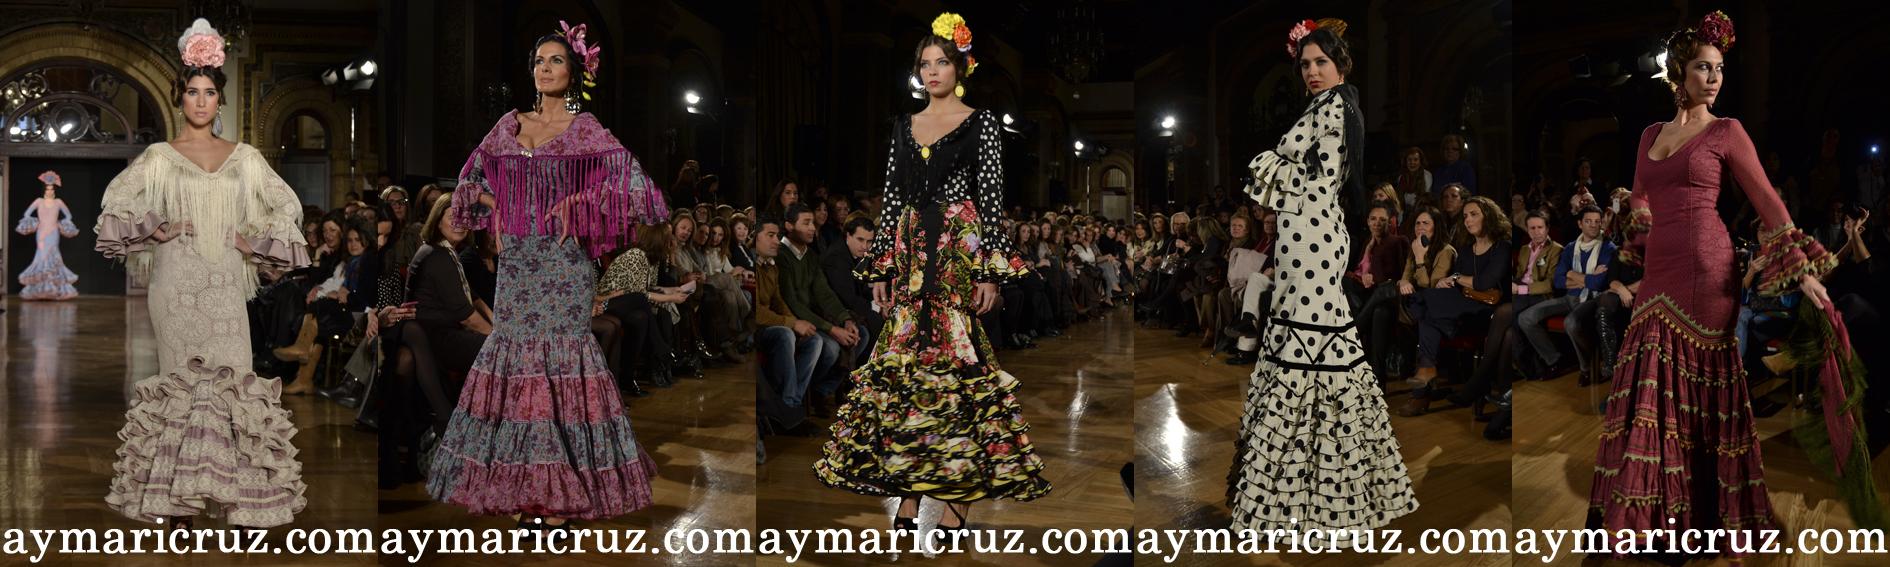 We Love Flamenco 2014: Viernes